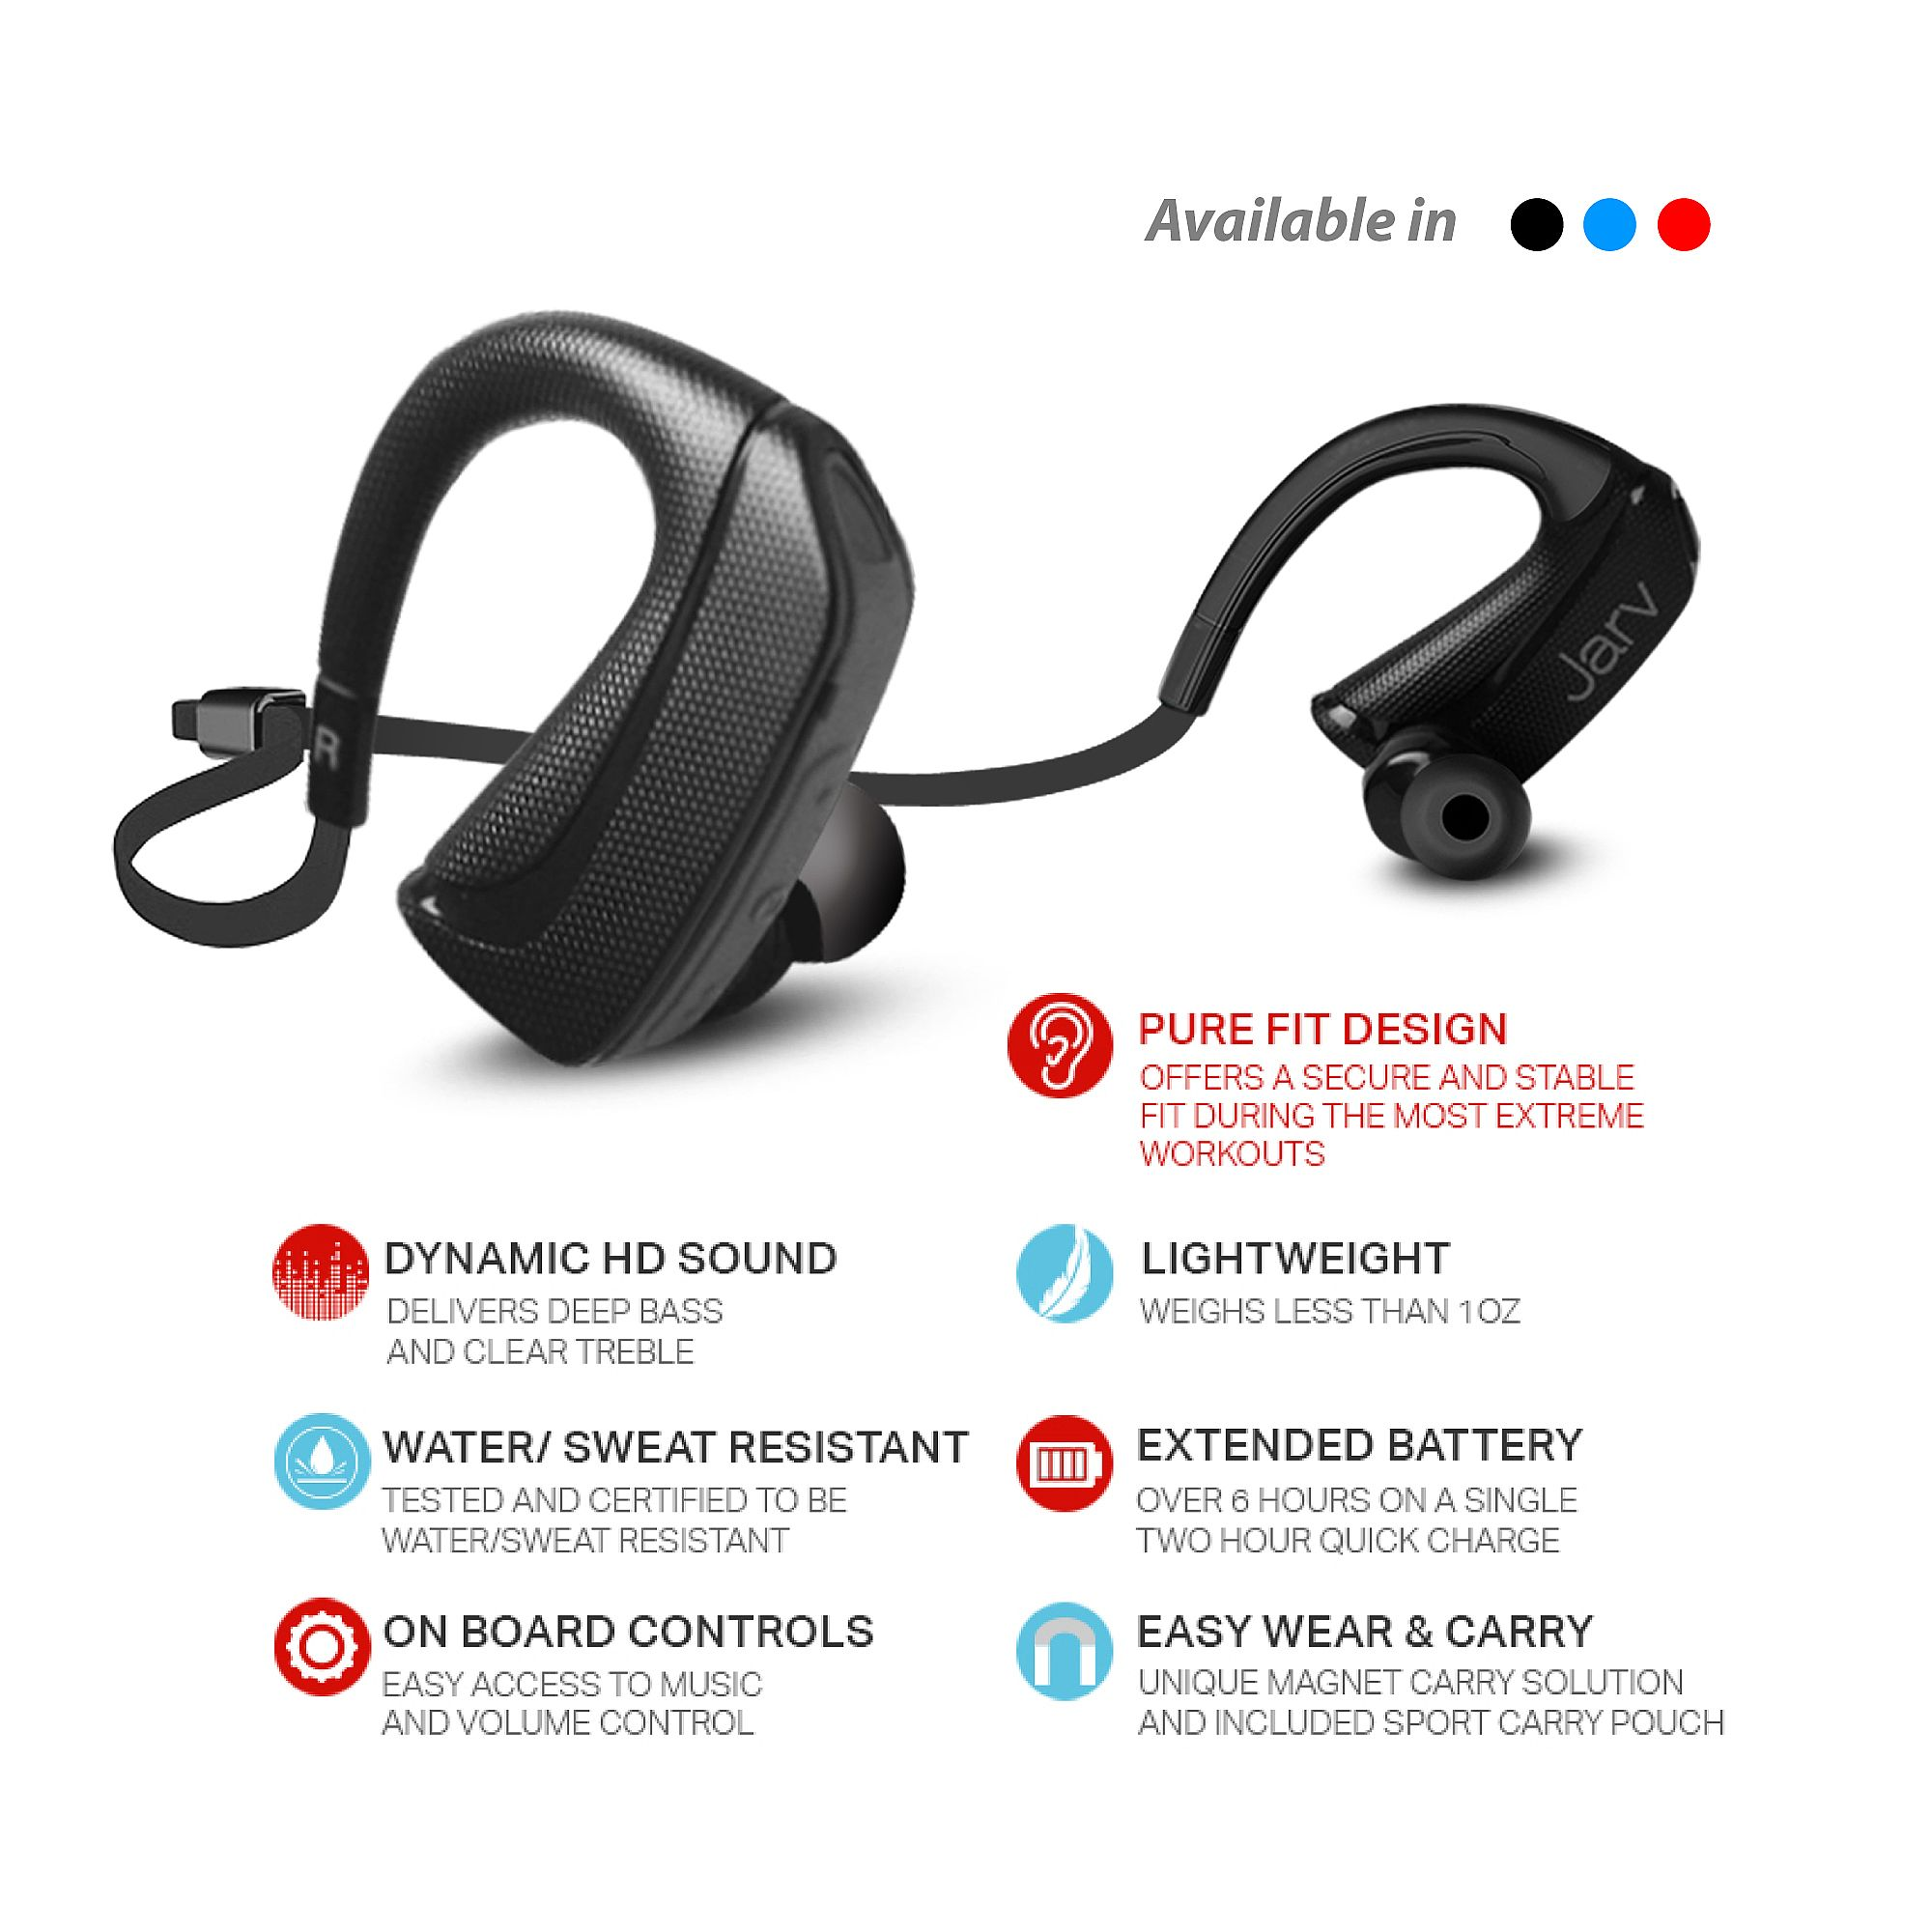 Jarv Pure Fit Version 2 Sport Wireless Bluetooth Earbuds Sweatproof And Water Resistant Ear Hook Design Bluetooth Headphones Blue At Mobilecityonline Com